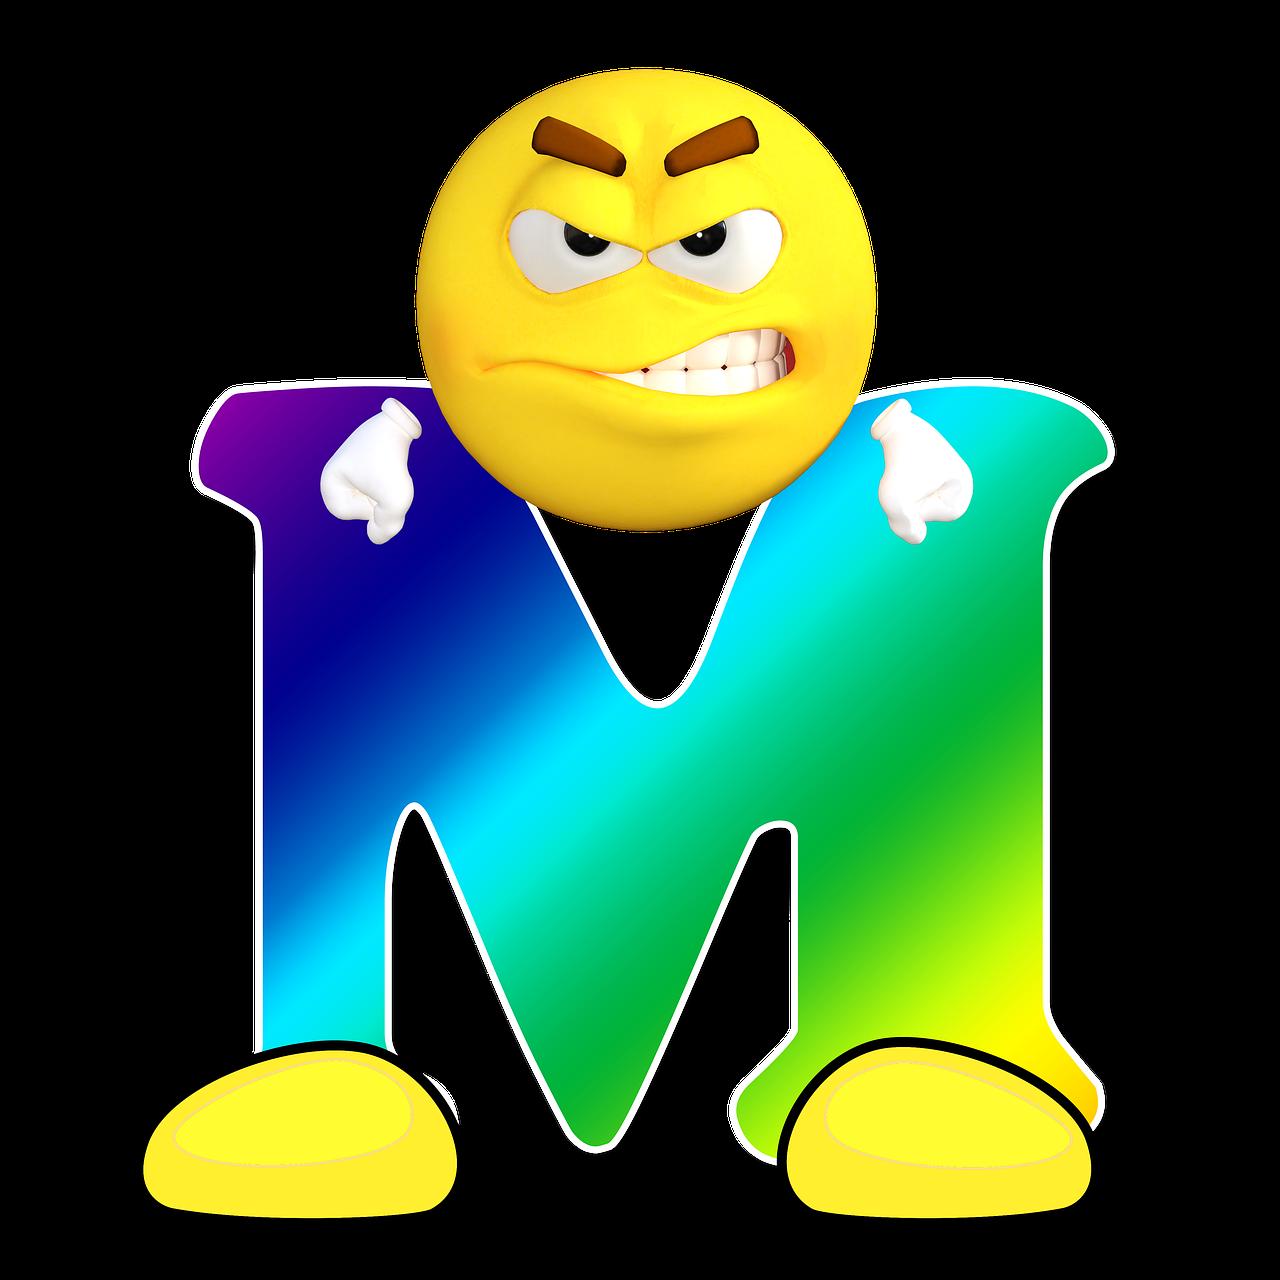 Abc,alphabet,smiley,letters,read - free photo from needpix com